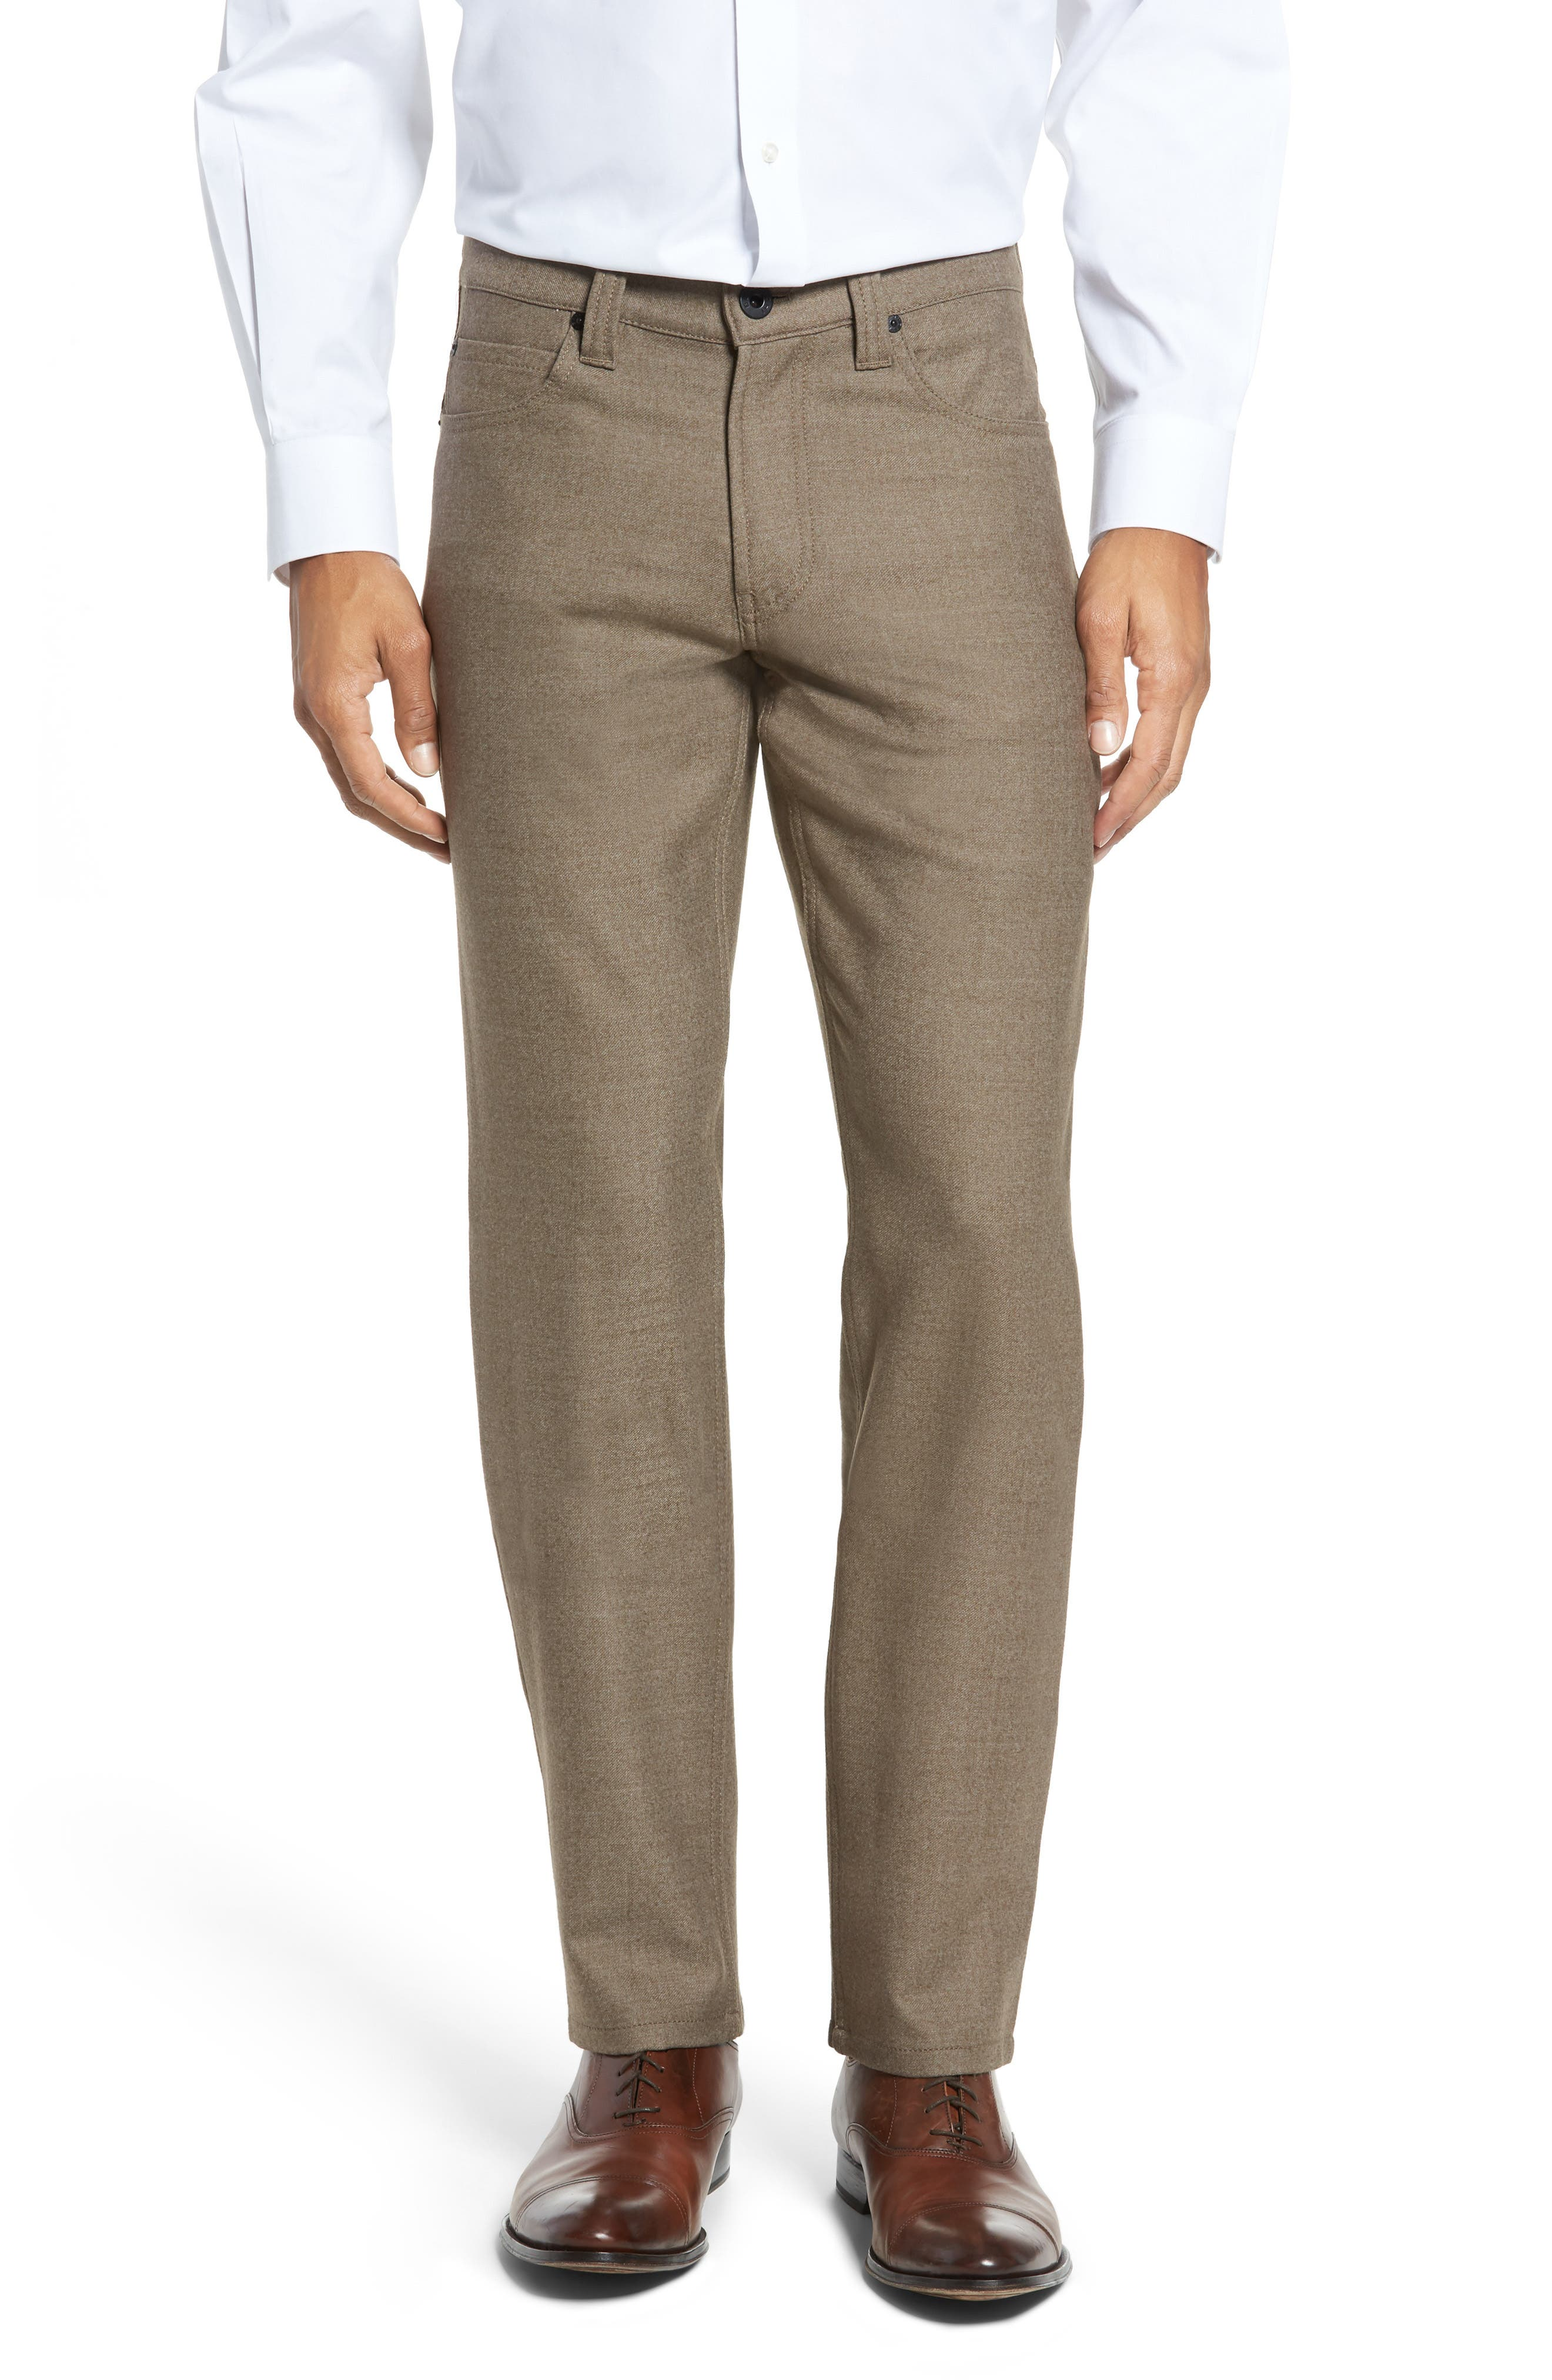 Bugatchi Wool Blend Pants (Regular & Big)